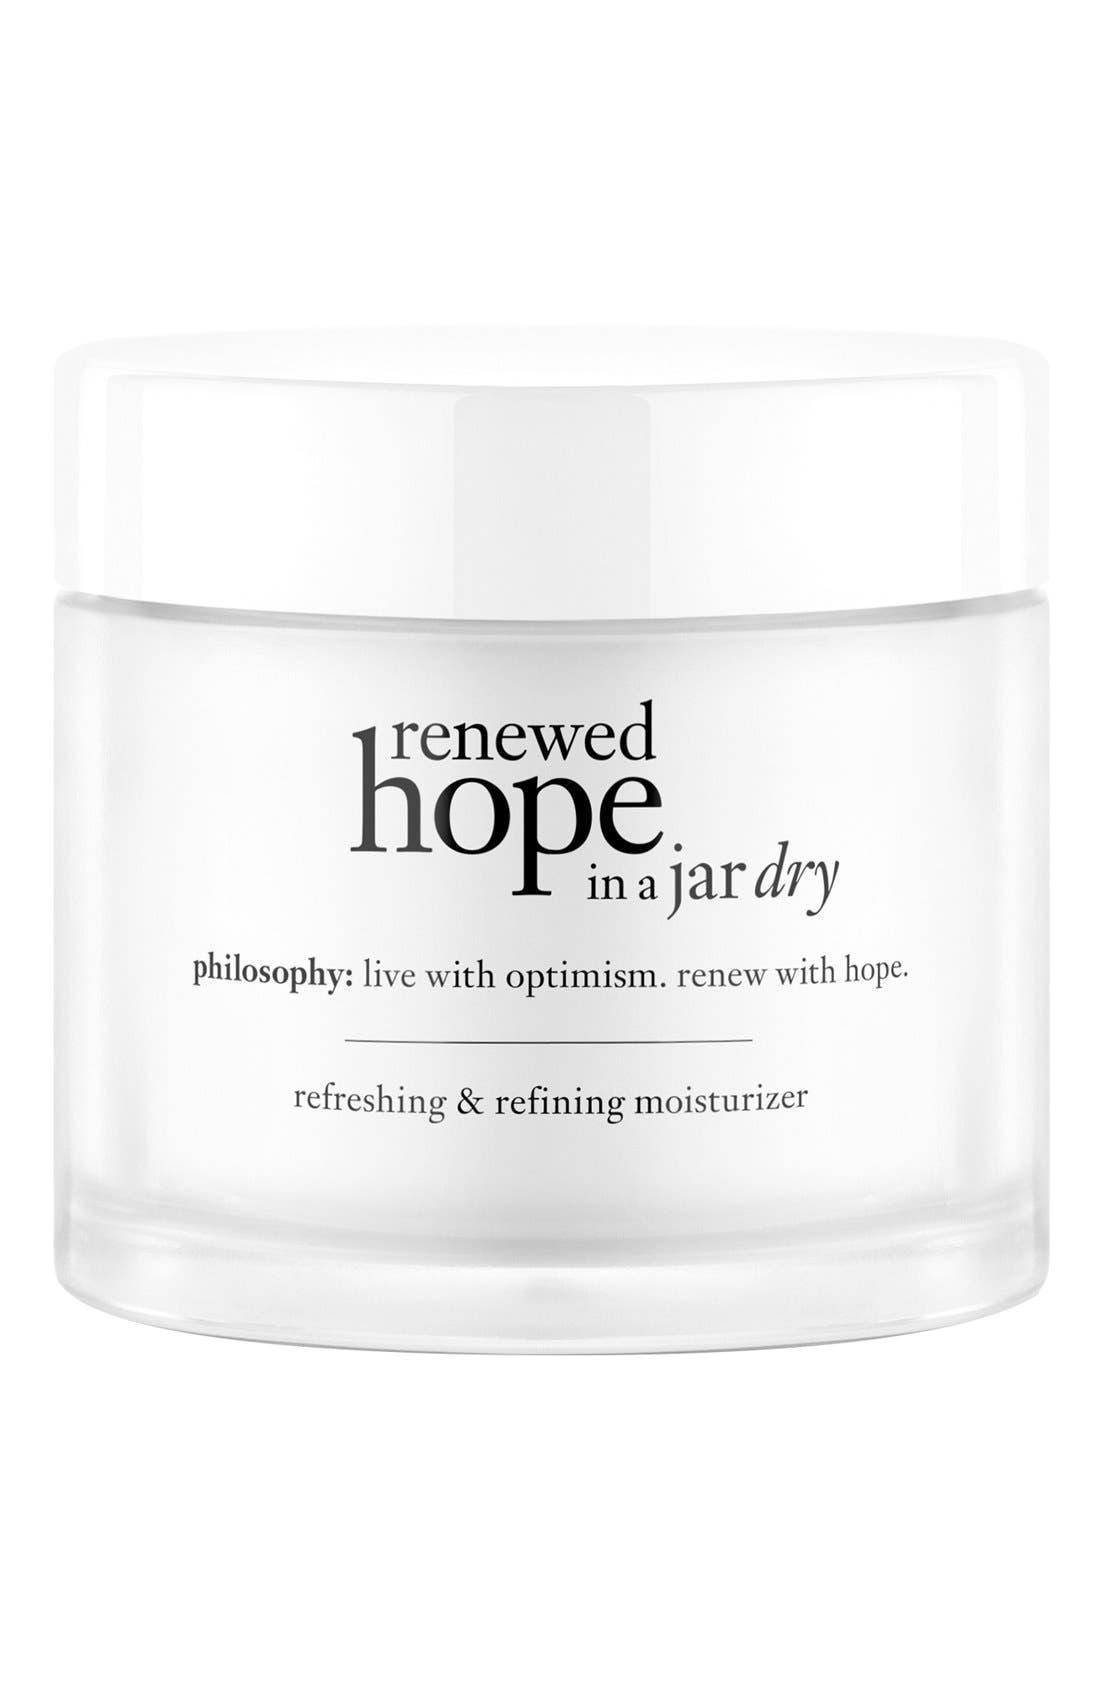 philosophy 'renewed hope in a jar dry' refreshing & refining moisturizer